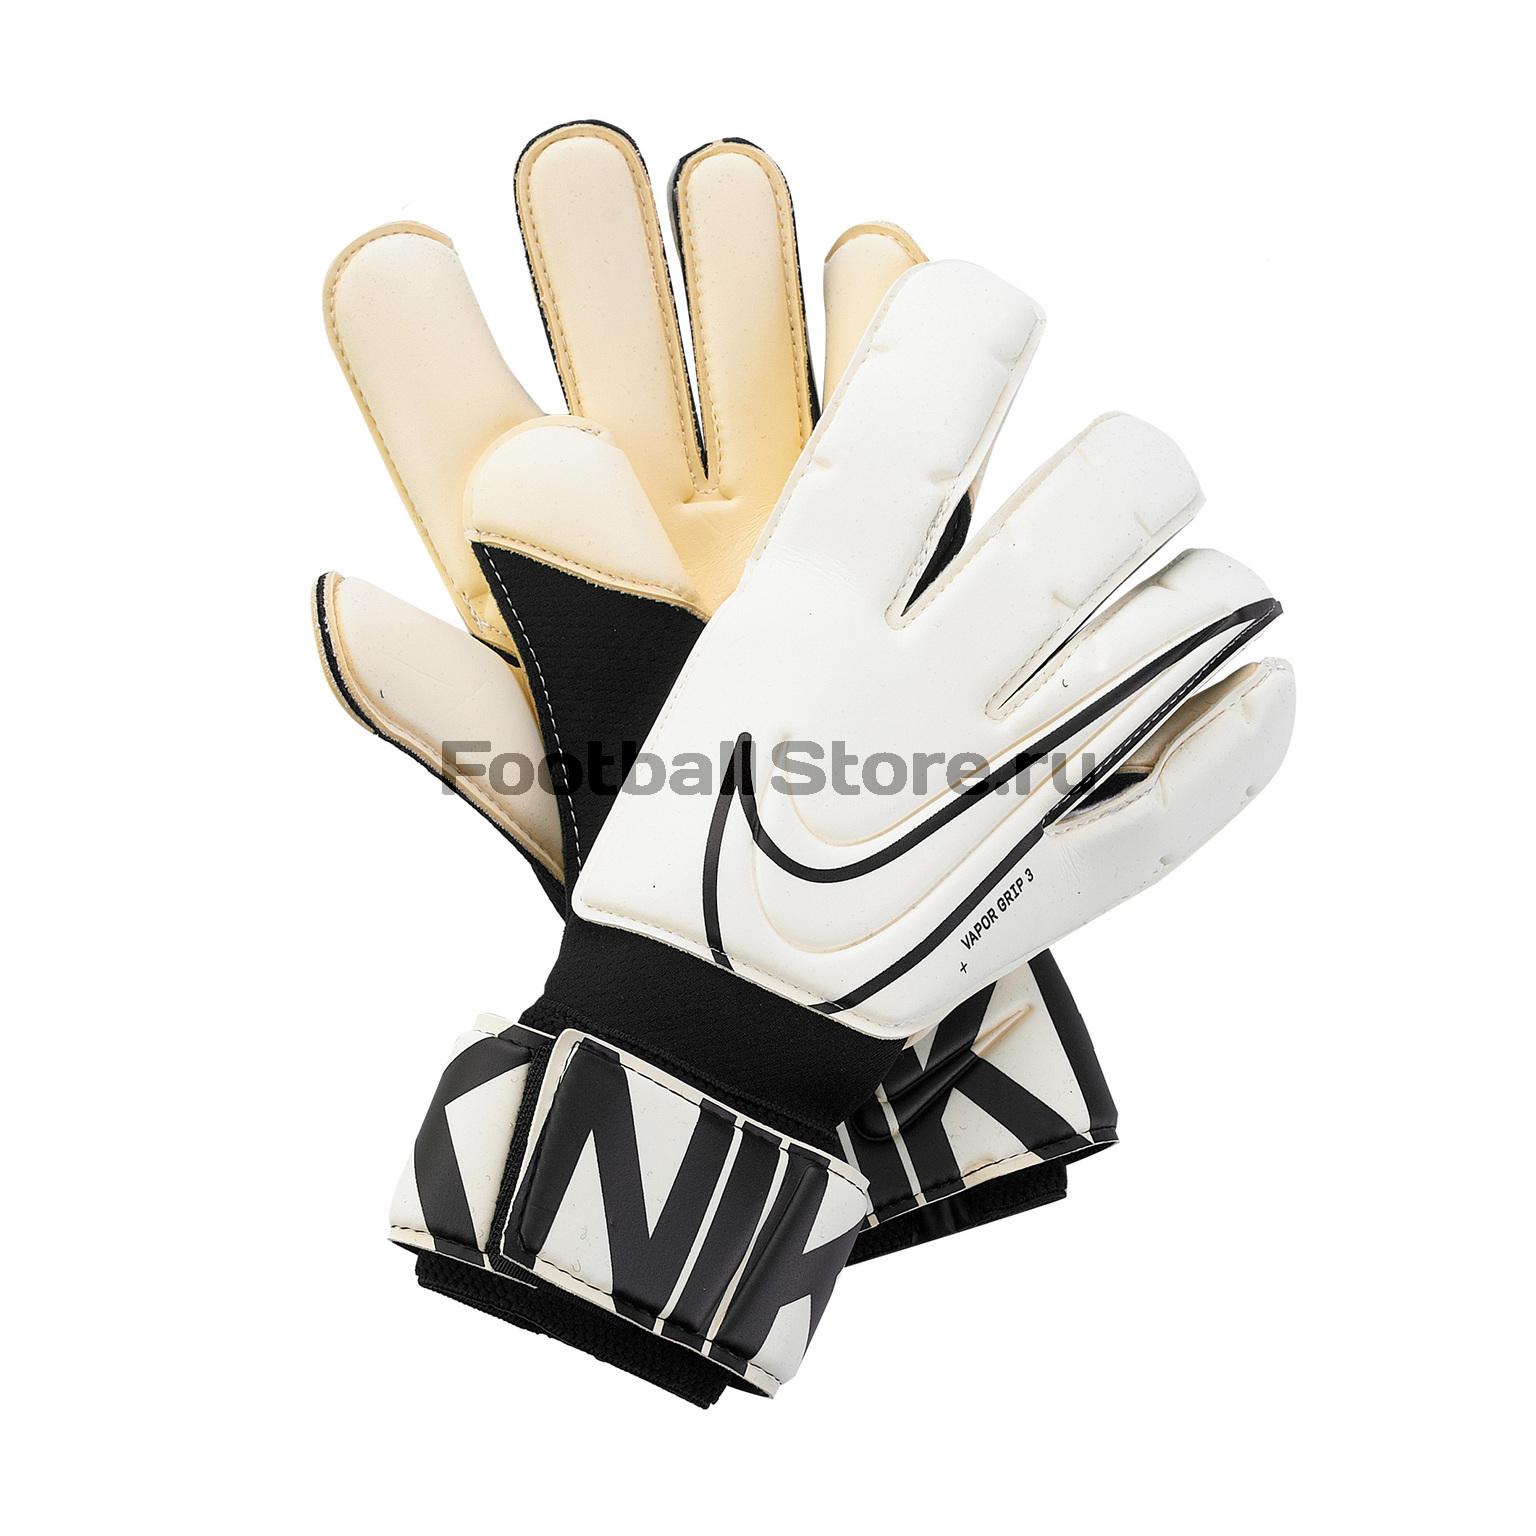 цена на Перчатки вратарские Nike Vapor Grip 3 GS3884-100